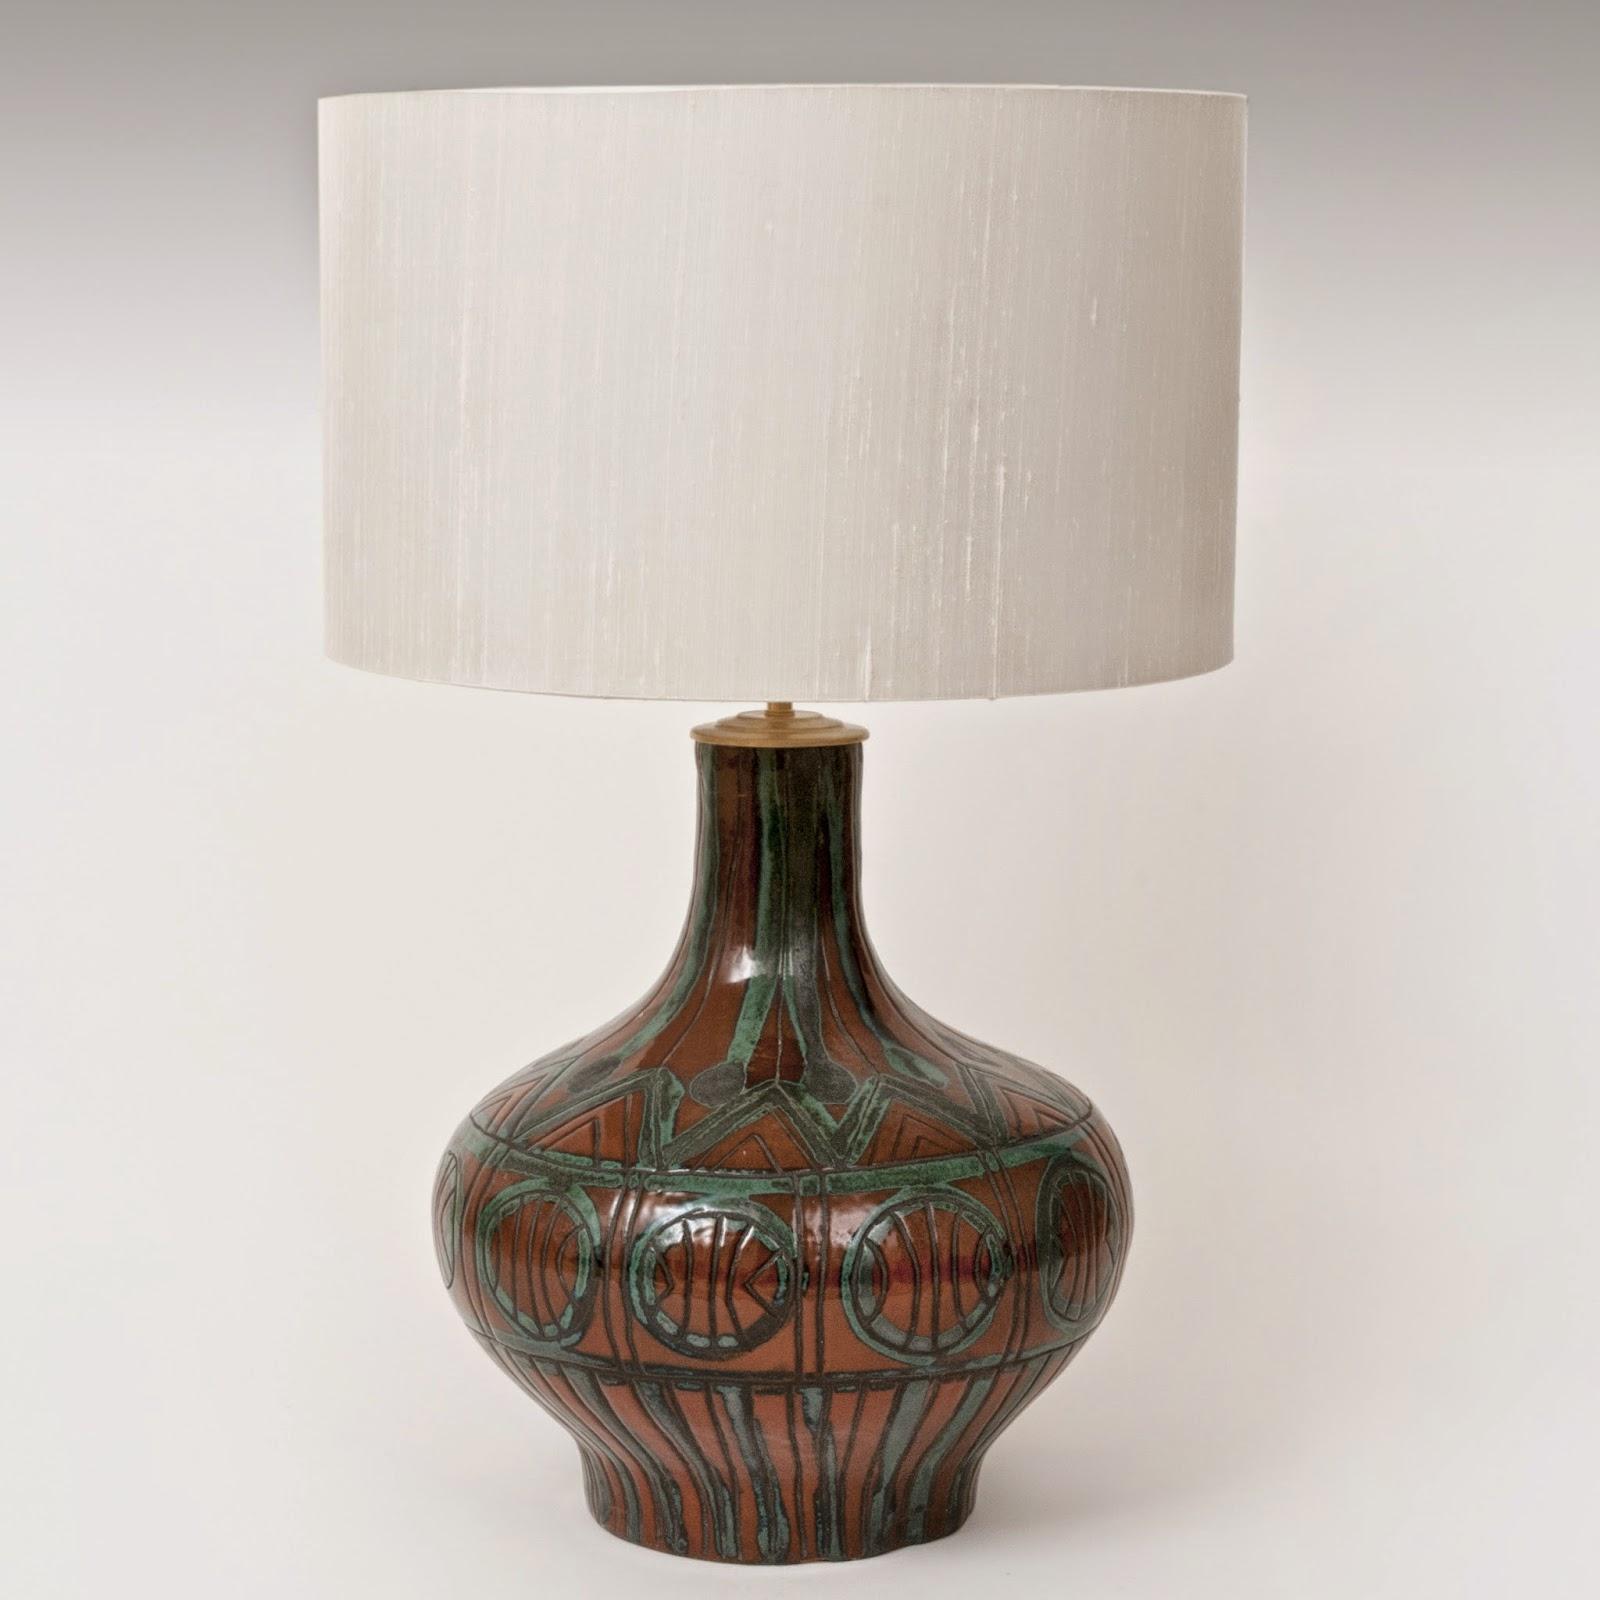 galerie riviera roger capron pied de lampe en c ramique. Black Bedroom Furniture Sets. Home Design Ideas